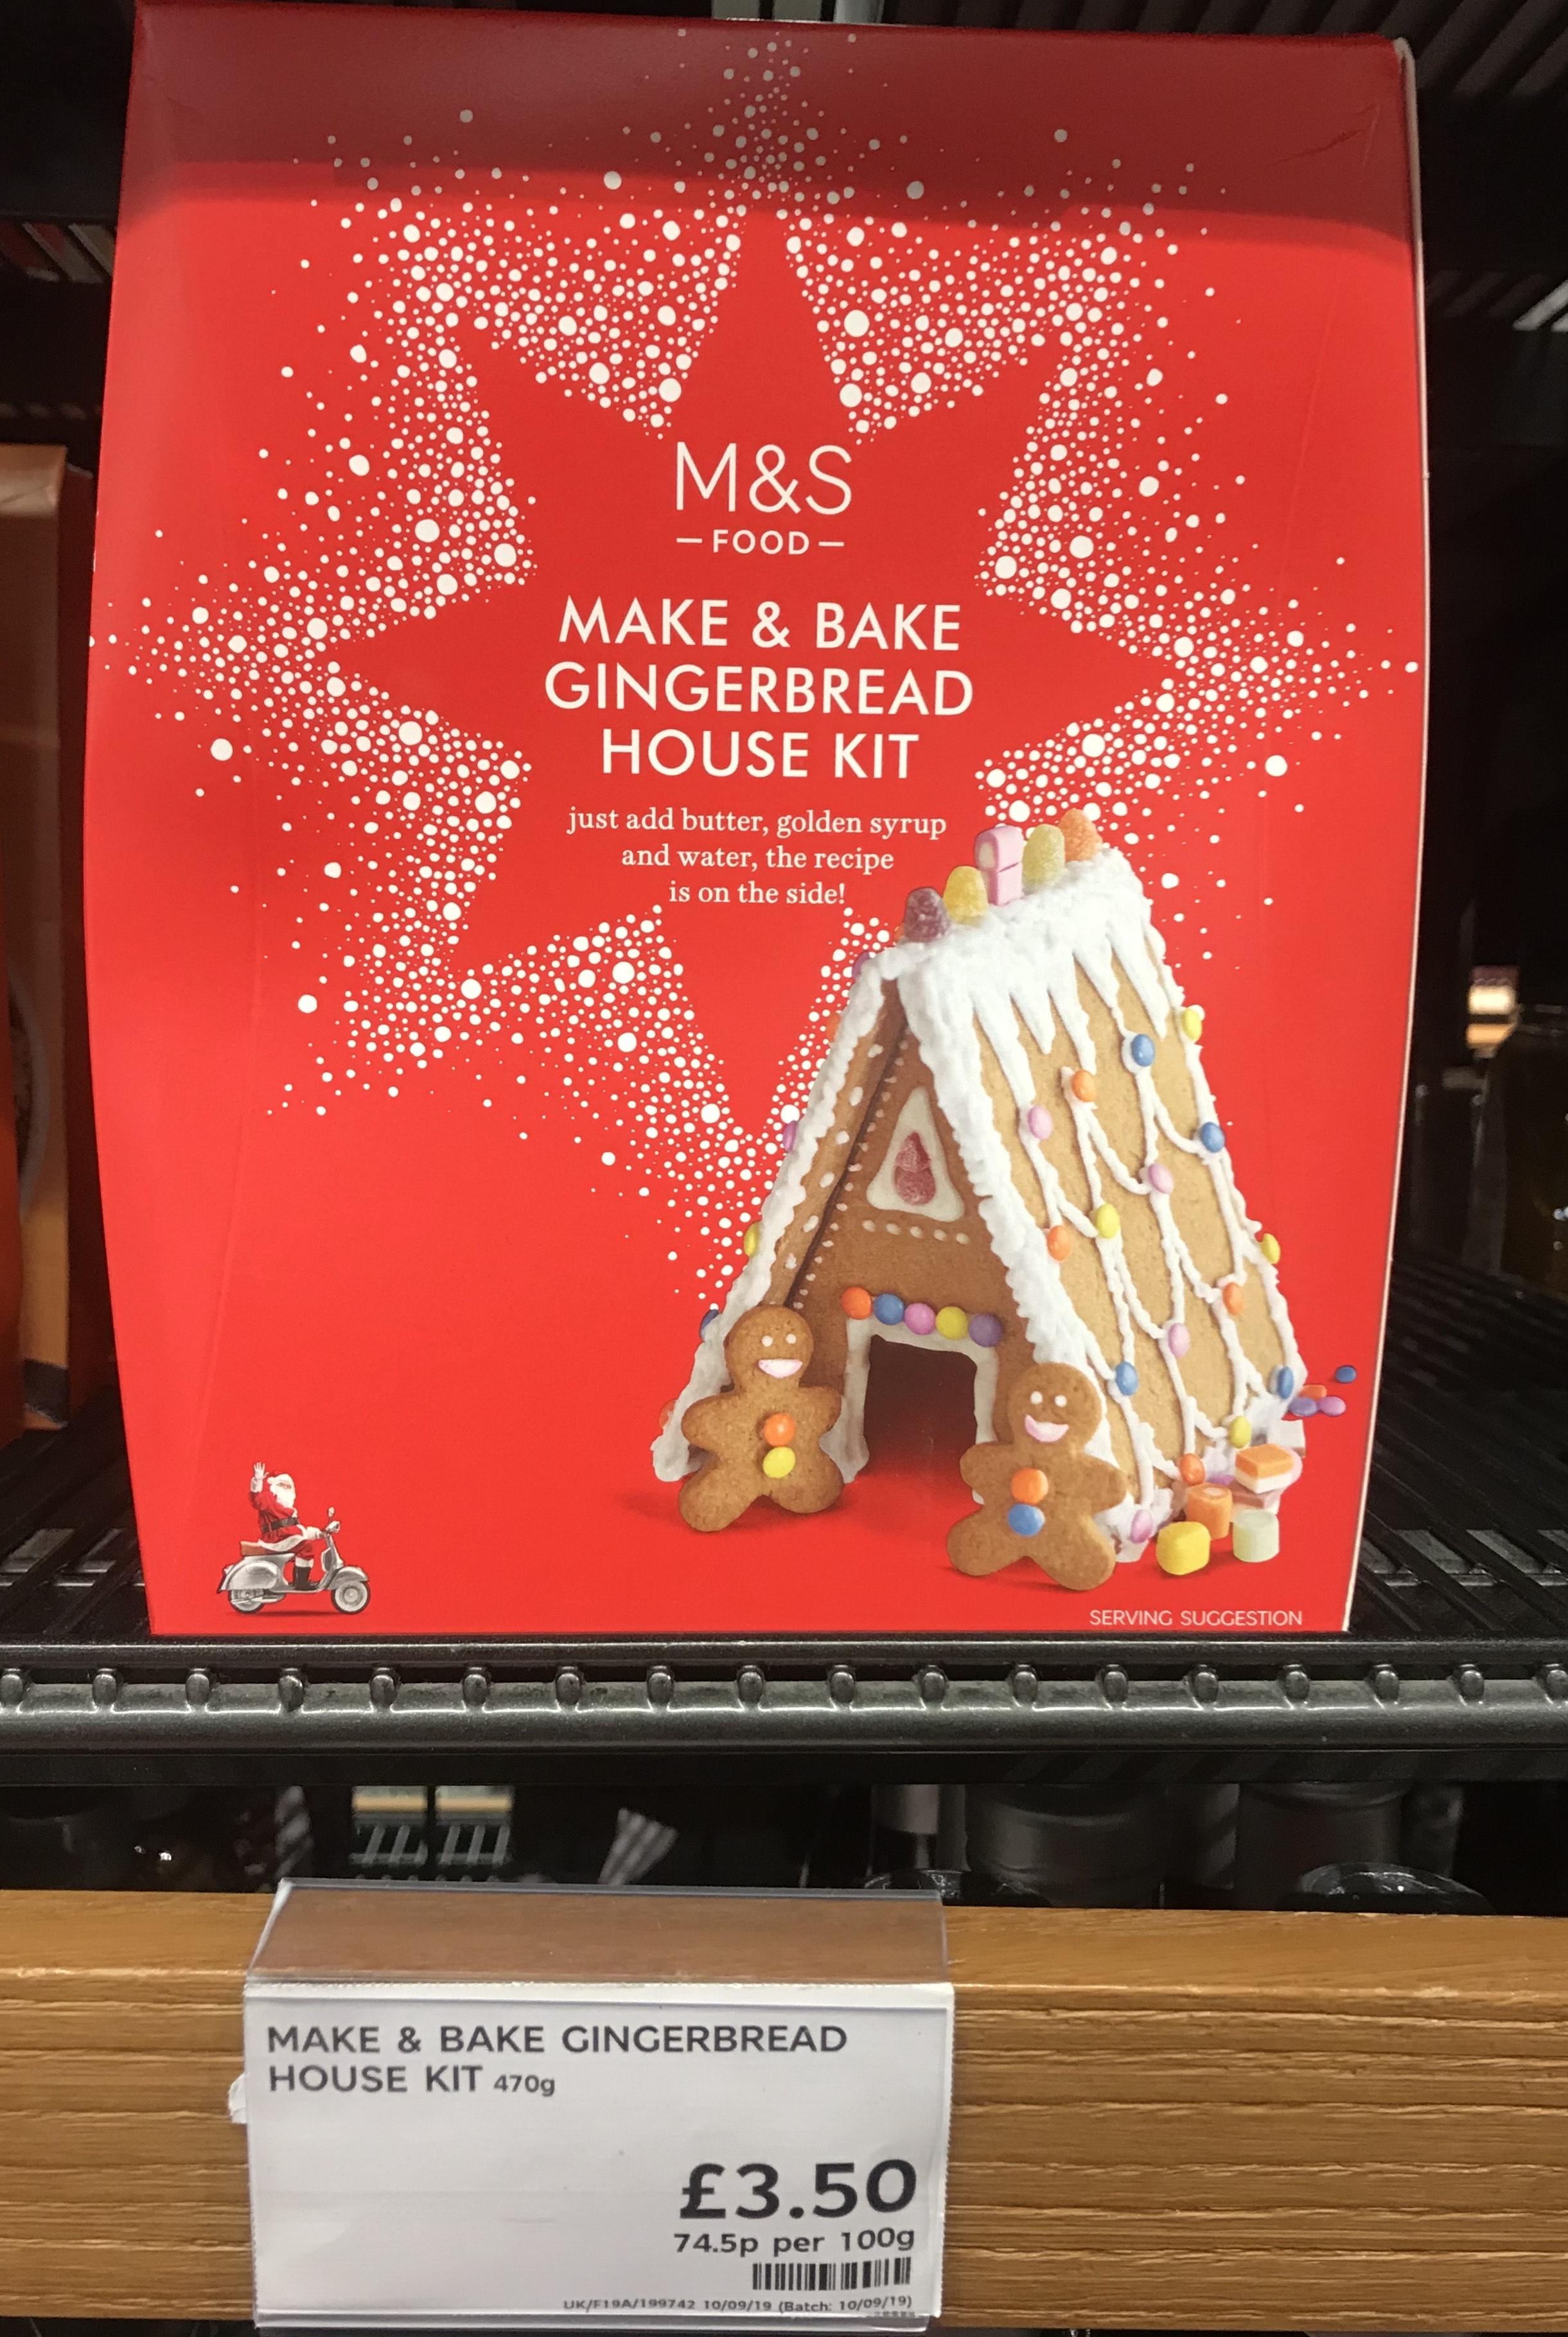 M&S Make & Bake Gingerbread House Kit £3.50 @ Marks & Spencers